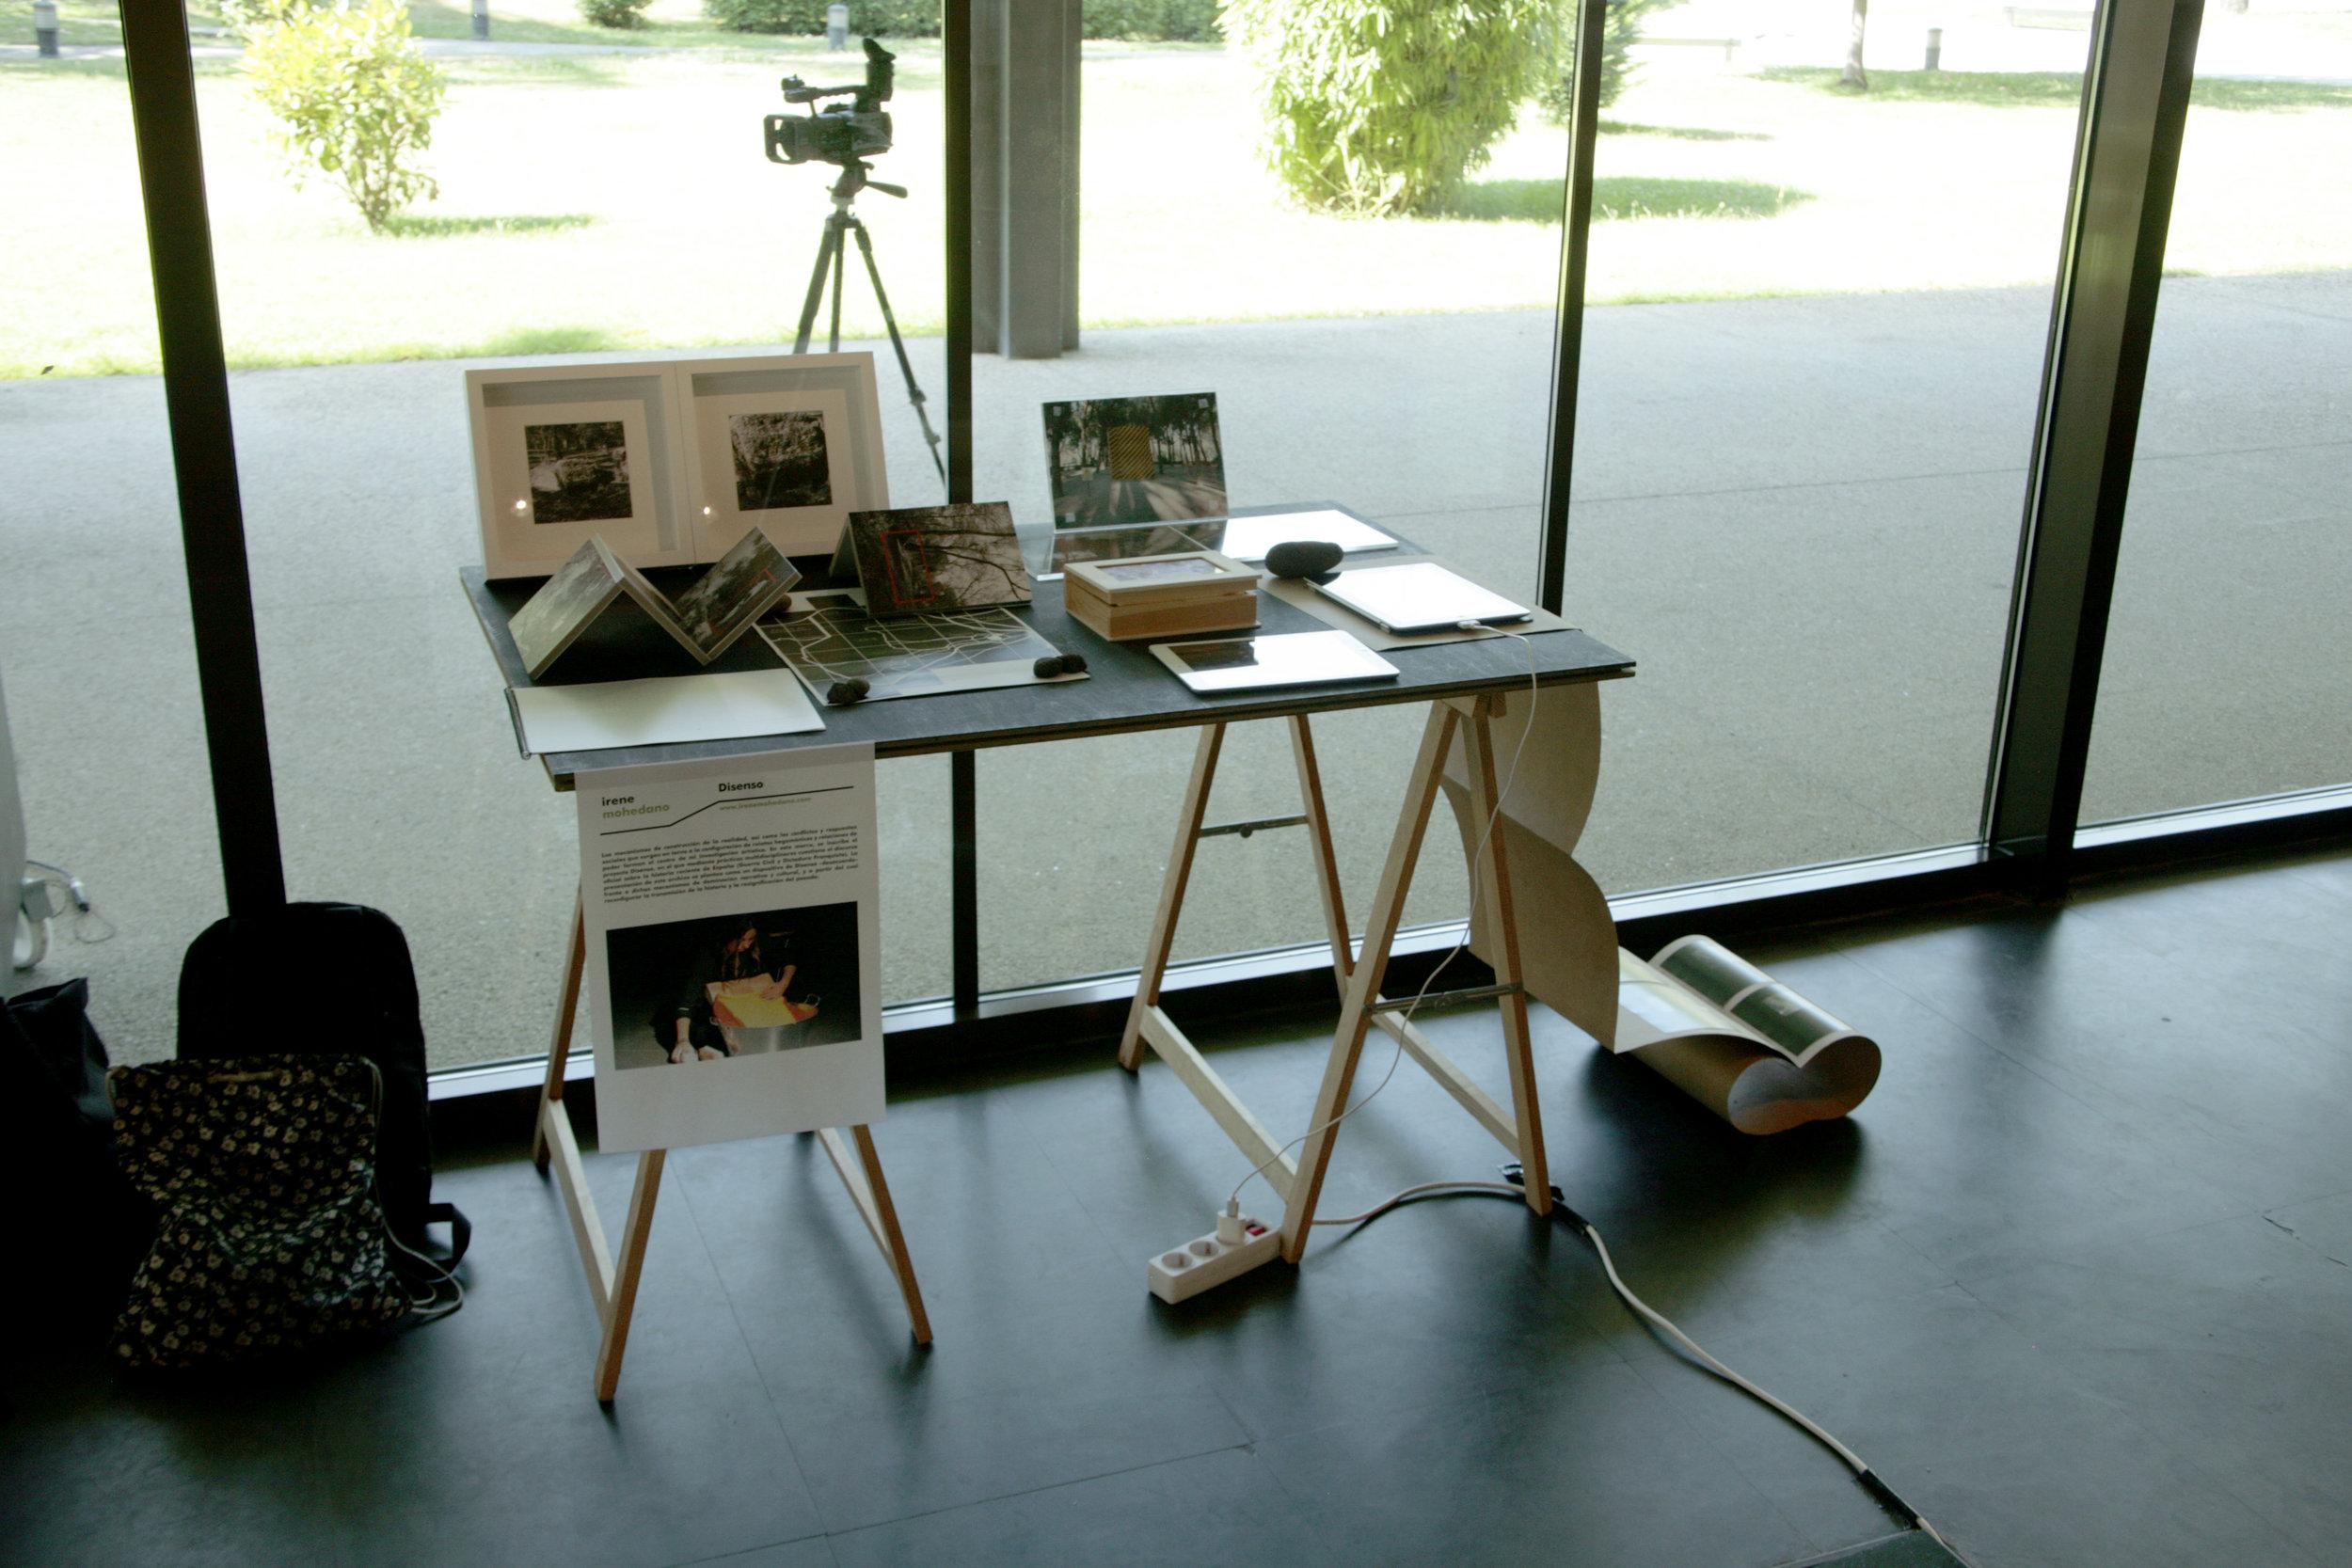 INTRANSIT (2016) Art Residency/ Presentation of Disenso Archive